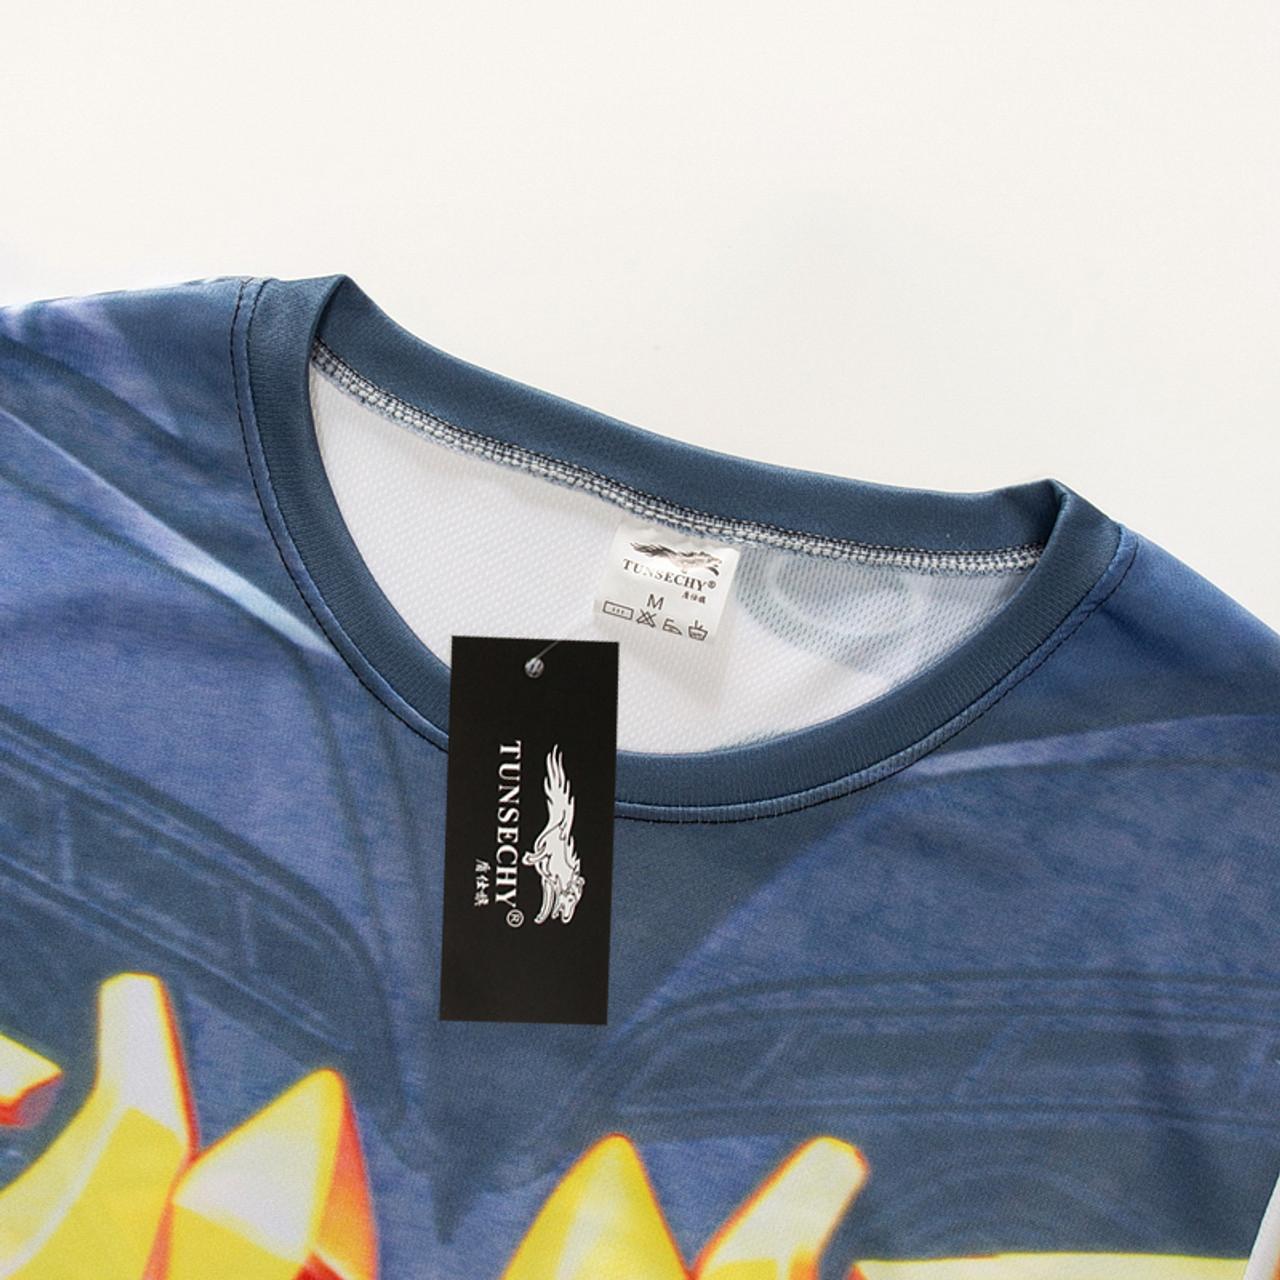 TUNSECHY Avengers Superhero T-shirts Batman Spiderman Superman Captain  America Digital printing T-shirts Free transportation